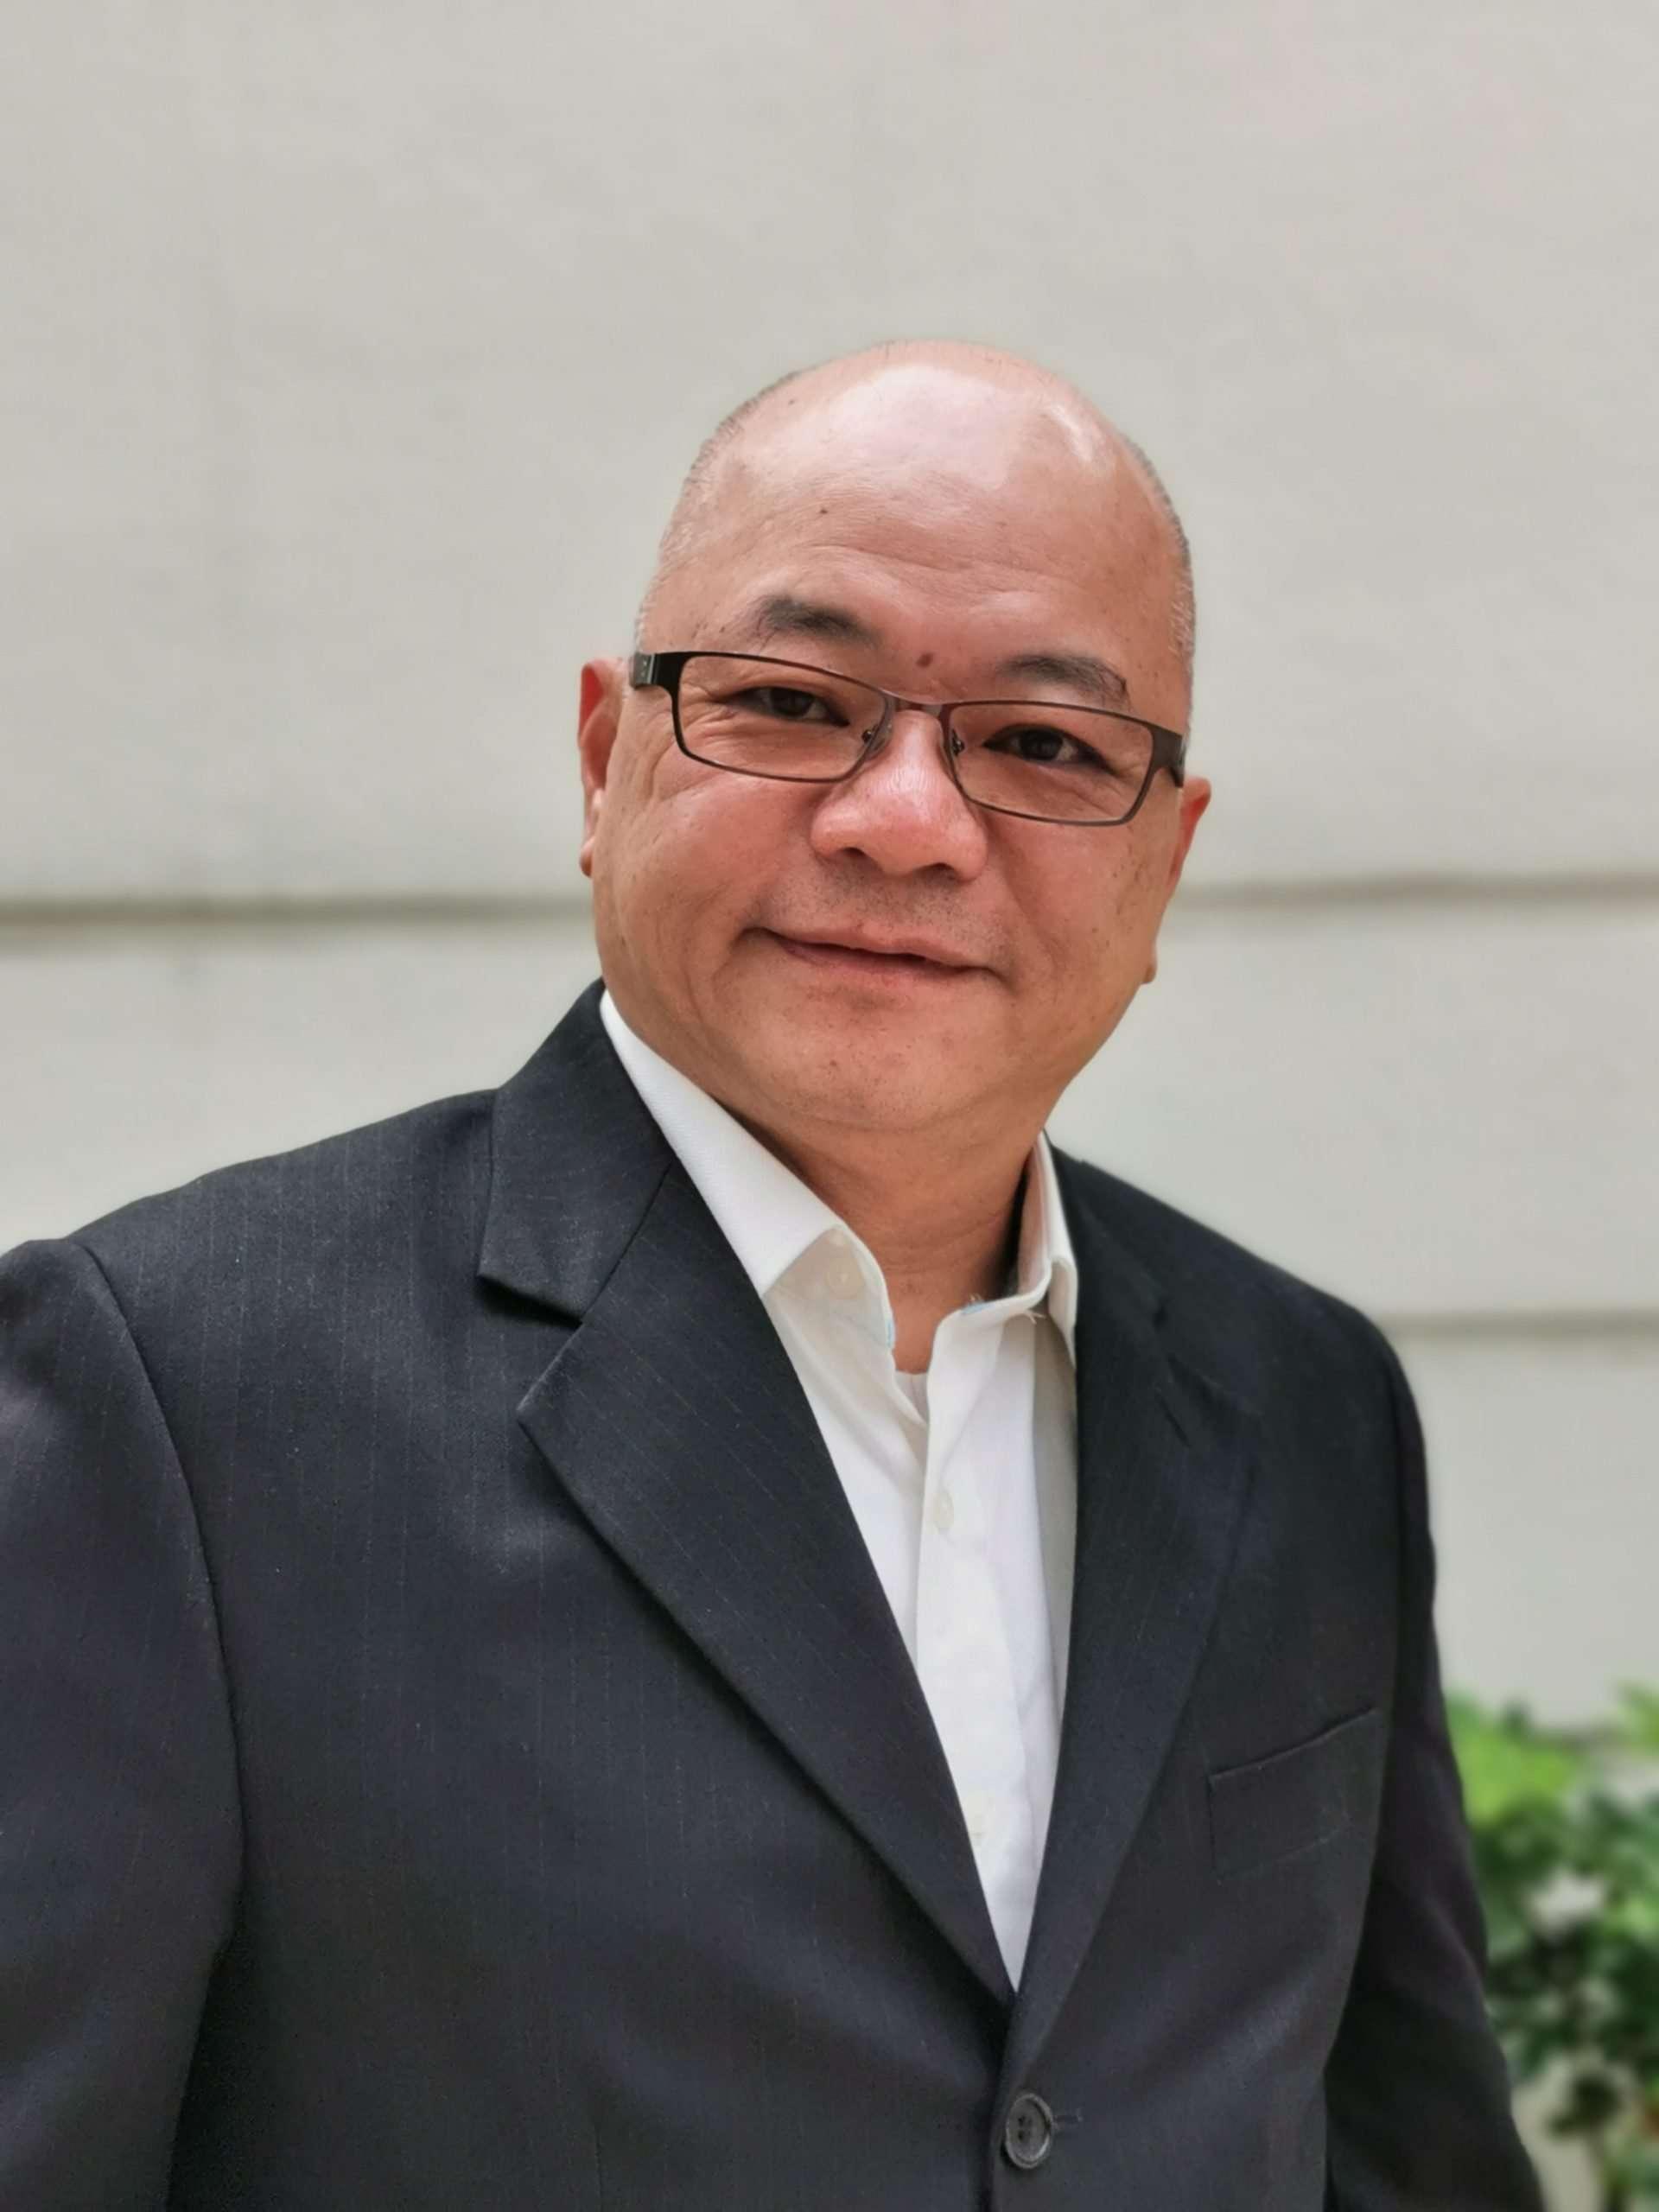 Alvin Chun, Sales Coach and Trainer